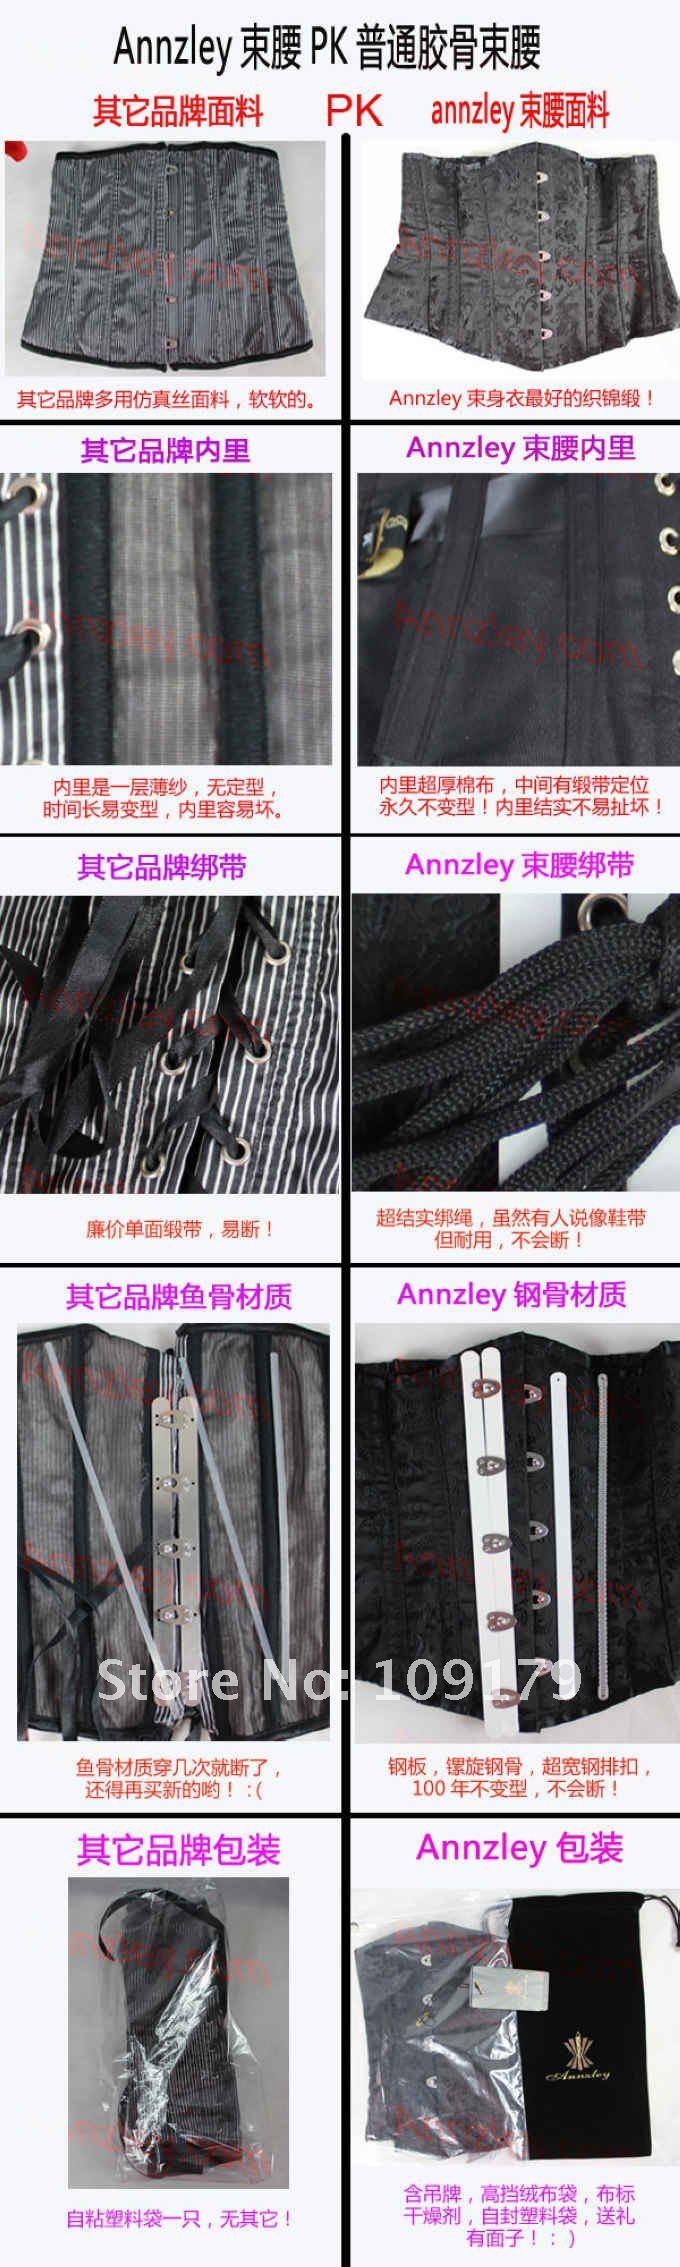 Annzley Corset Quality.jpg